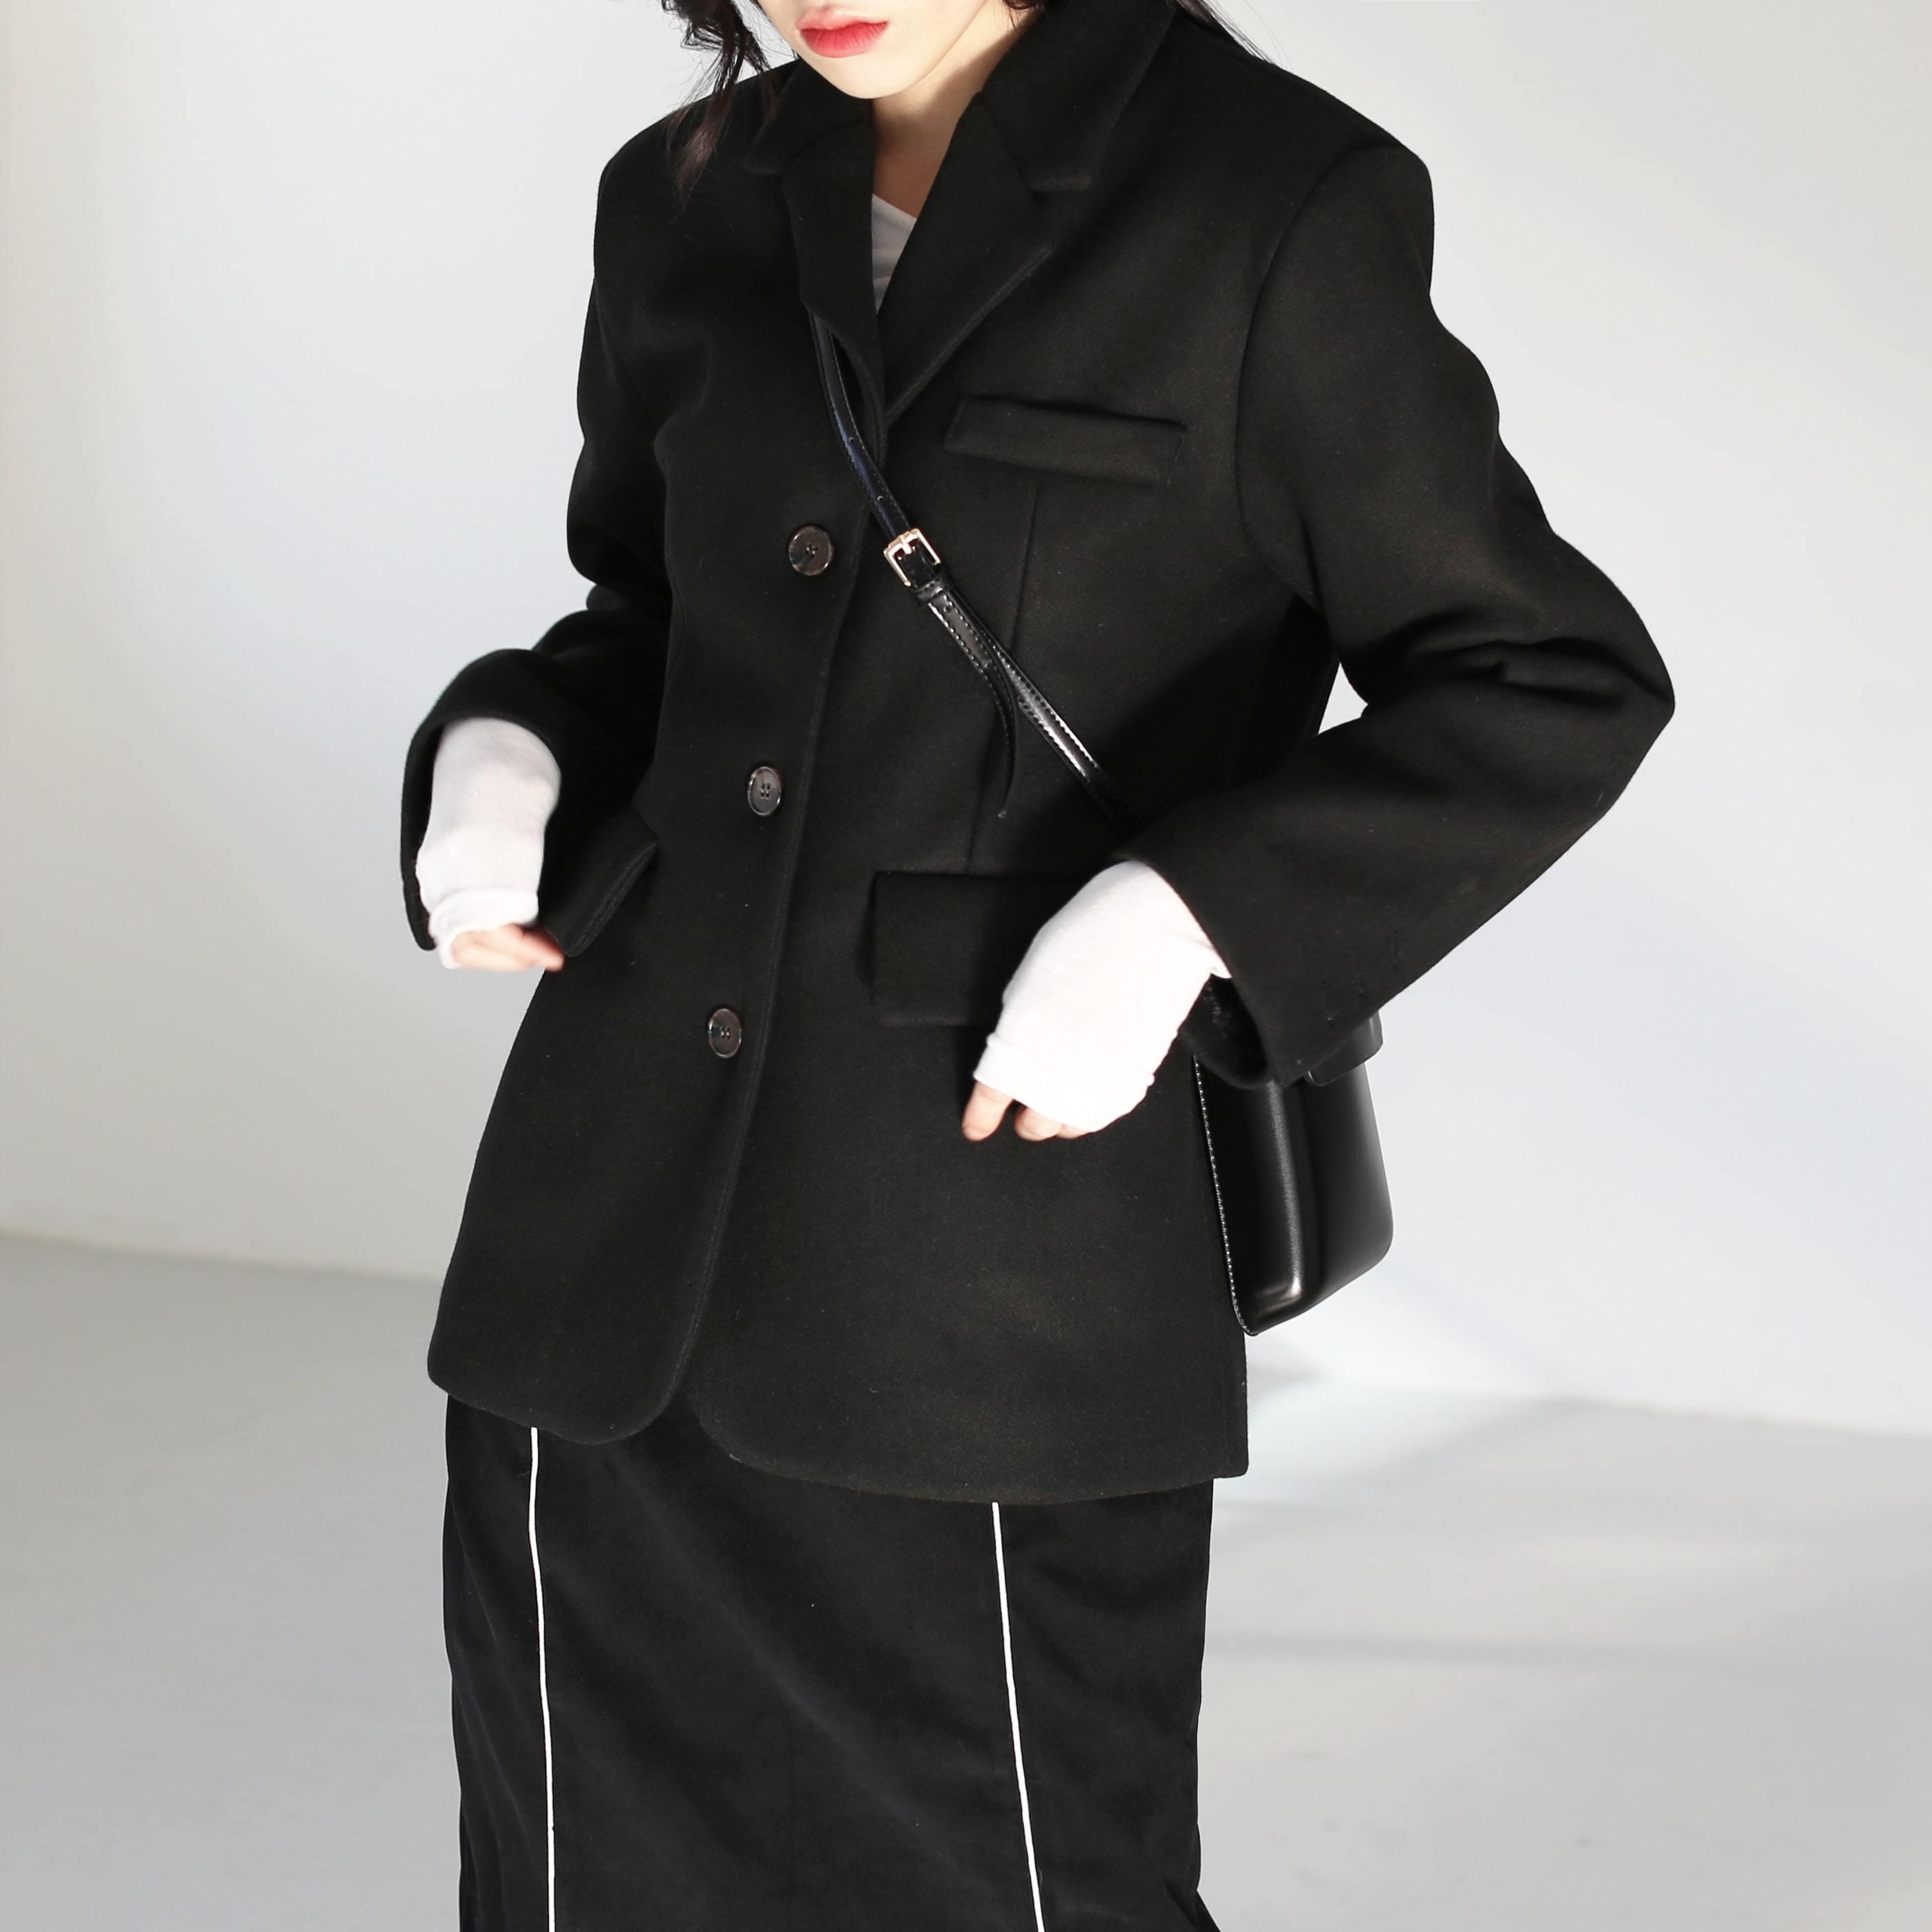 韓國空運 - Title Wool Button Jacket 夾克